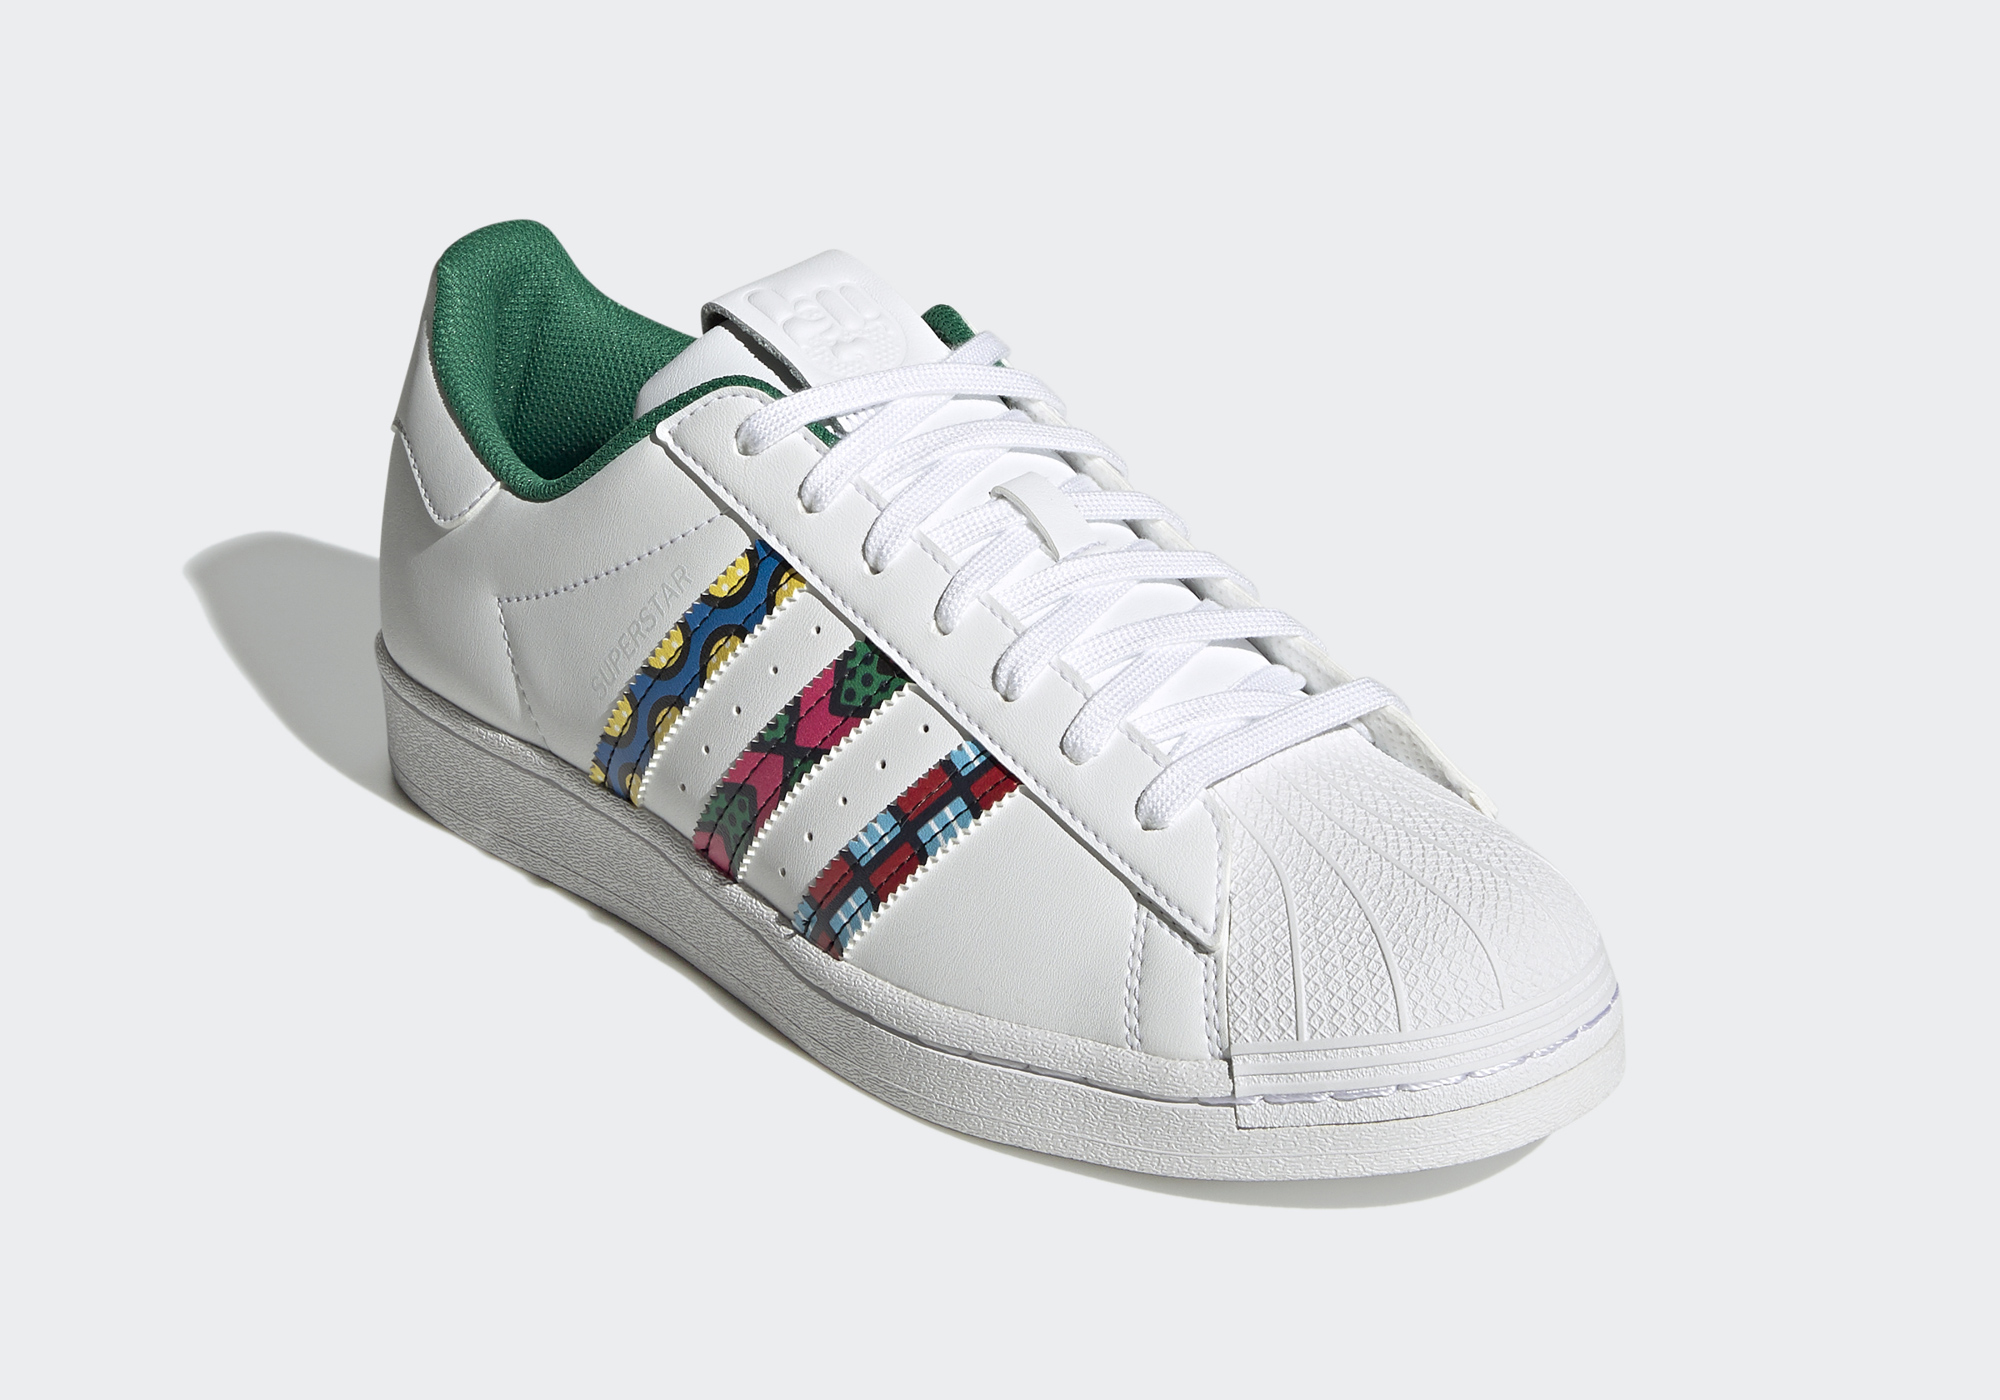 AP_CraigKarl_Adidas_Originals_HEADER_2x